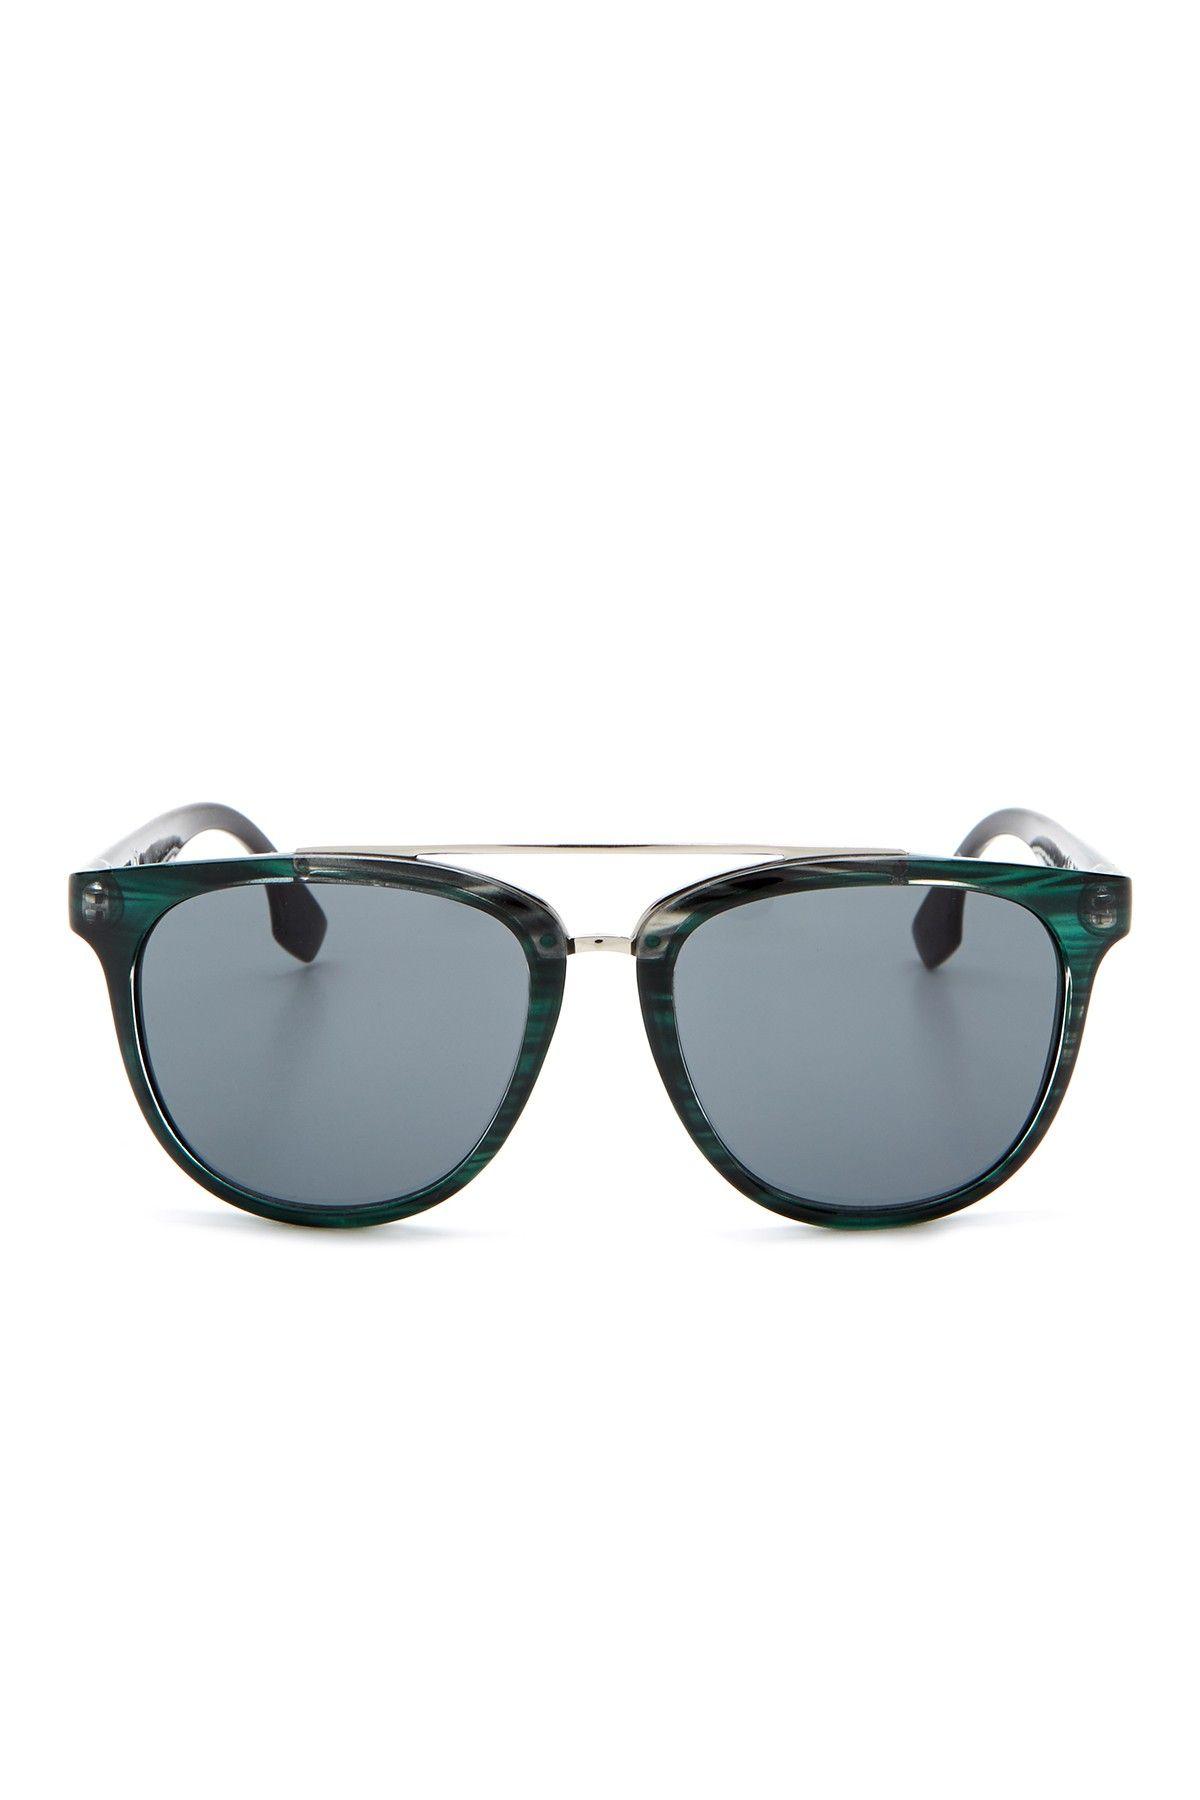 Women's Double Bridge Plastic Aviator Sunglasses by BCBG on @HauteLook